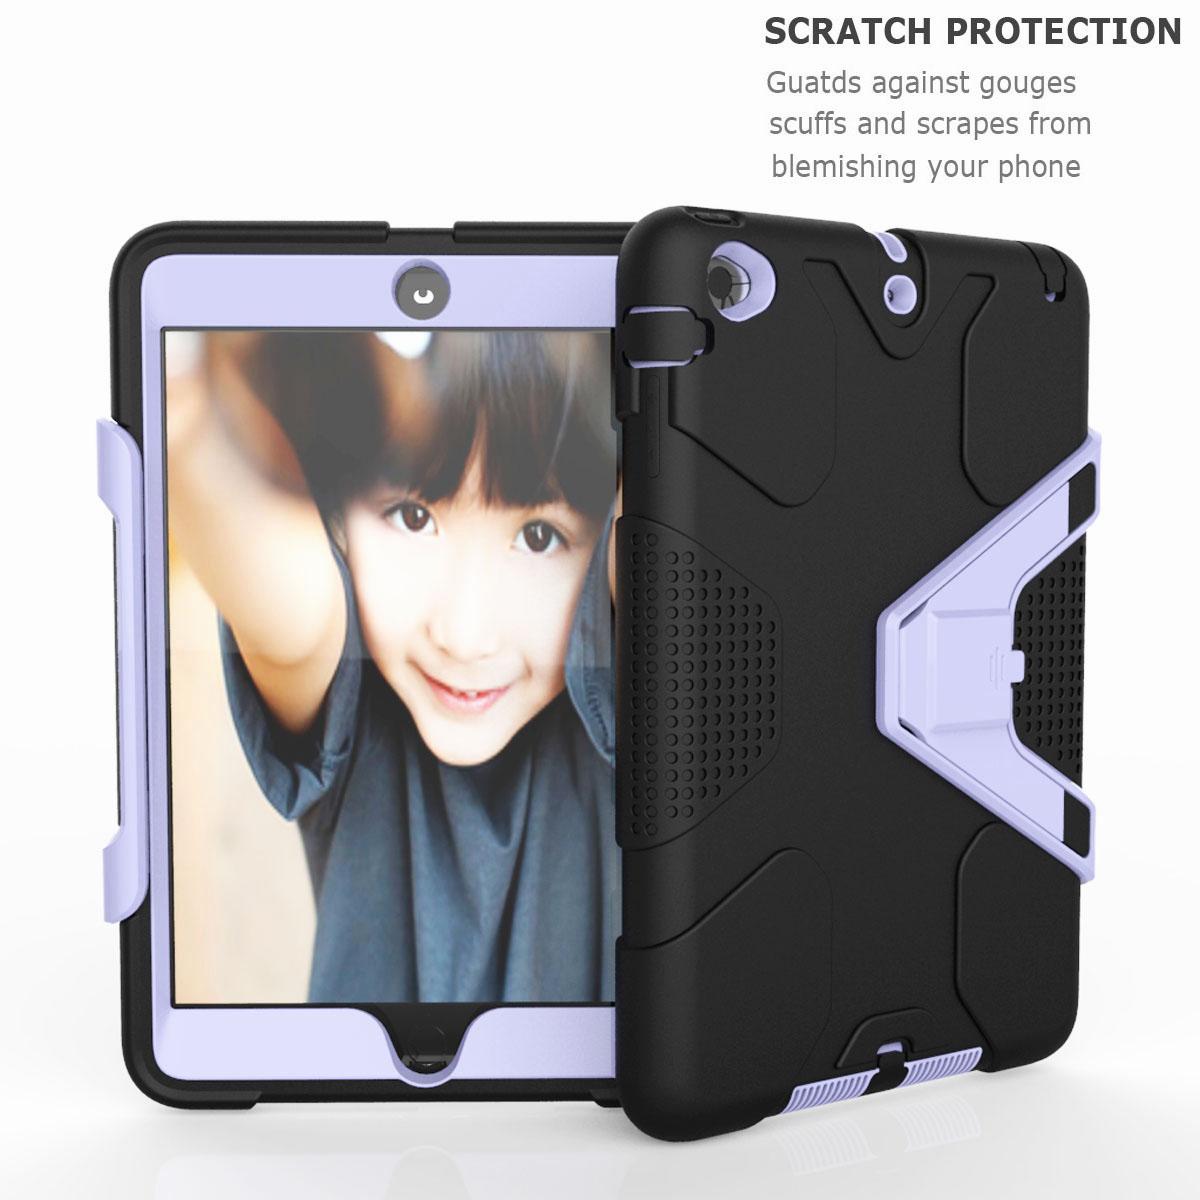 Luxury-Shockproof-Tough-Armor-with-Hard-Kickstand-Case-For-Apple-iPad-Mini-1-2-3 thumbnail 50